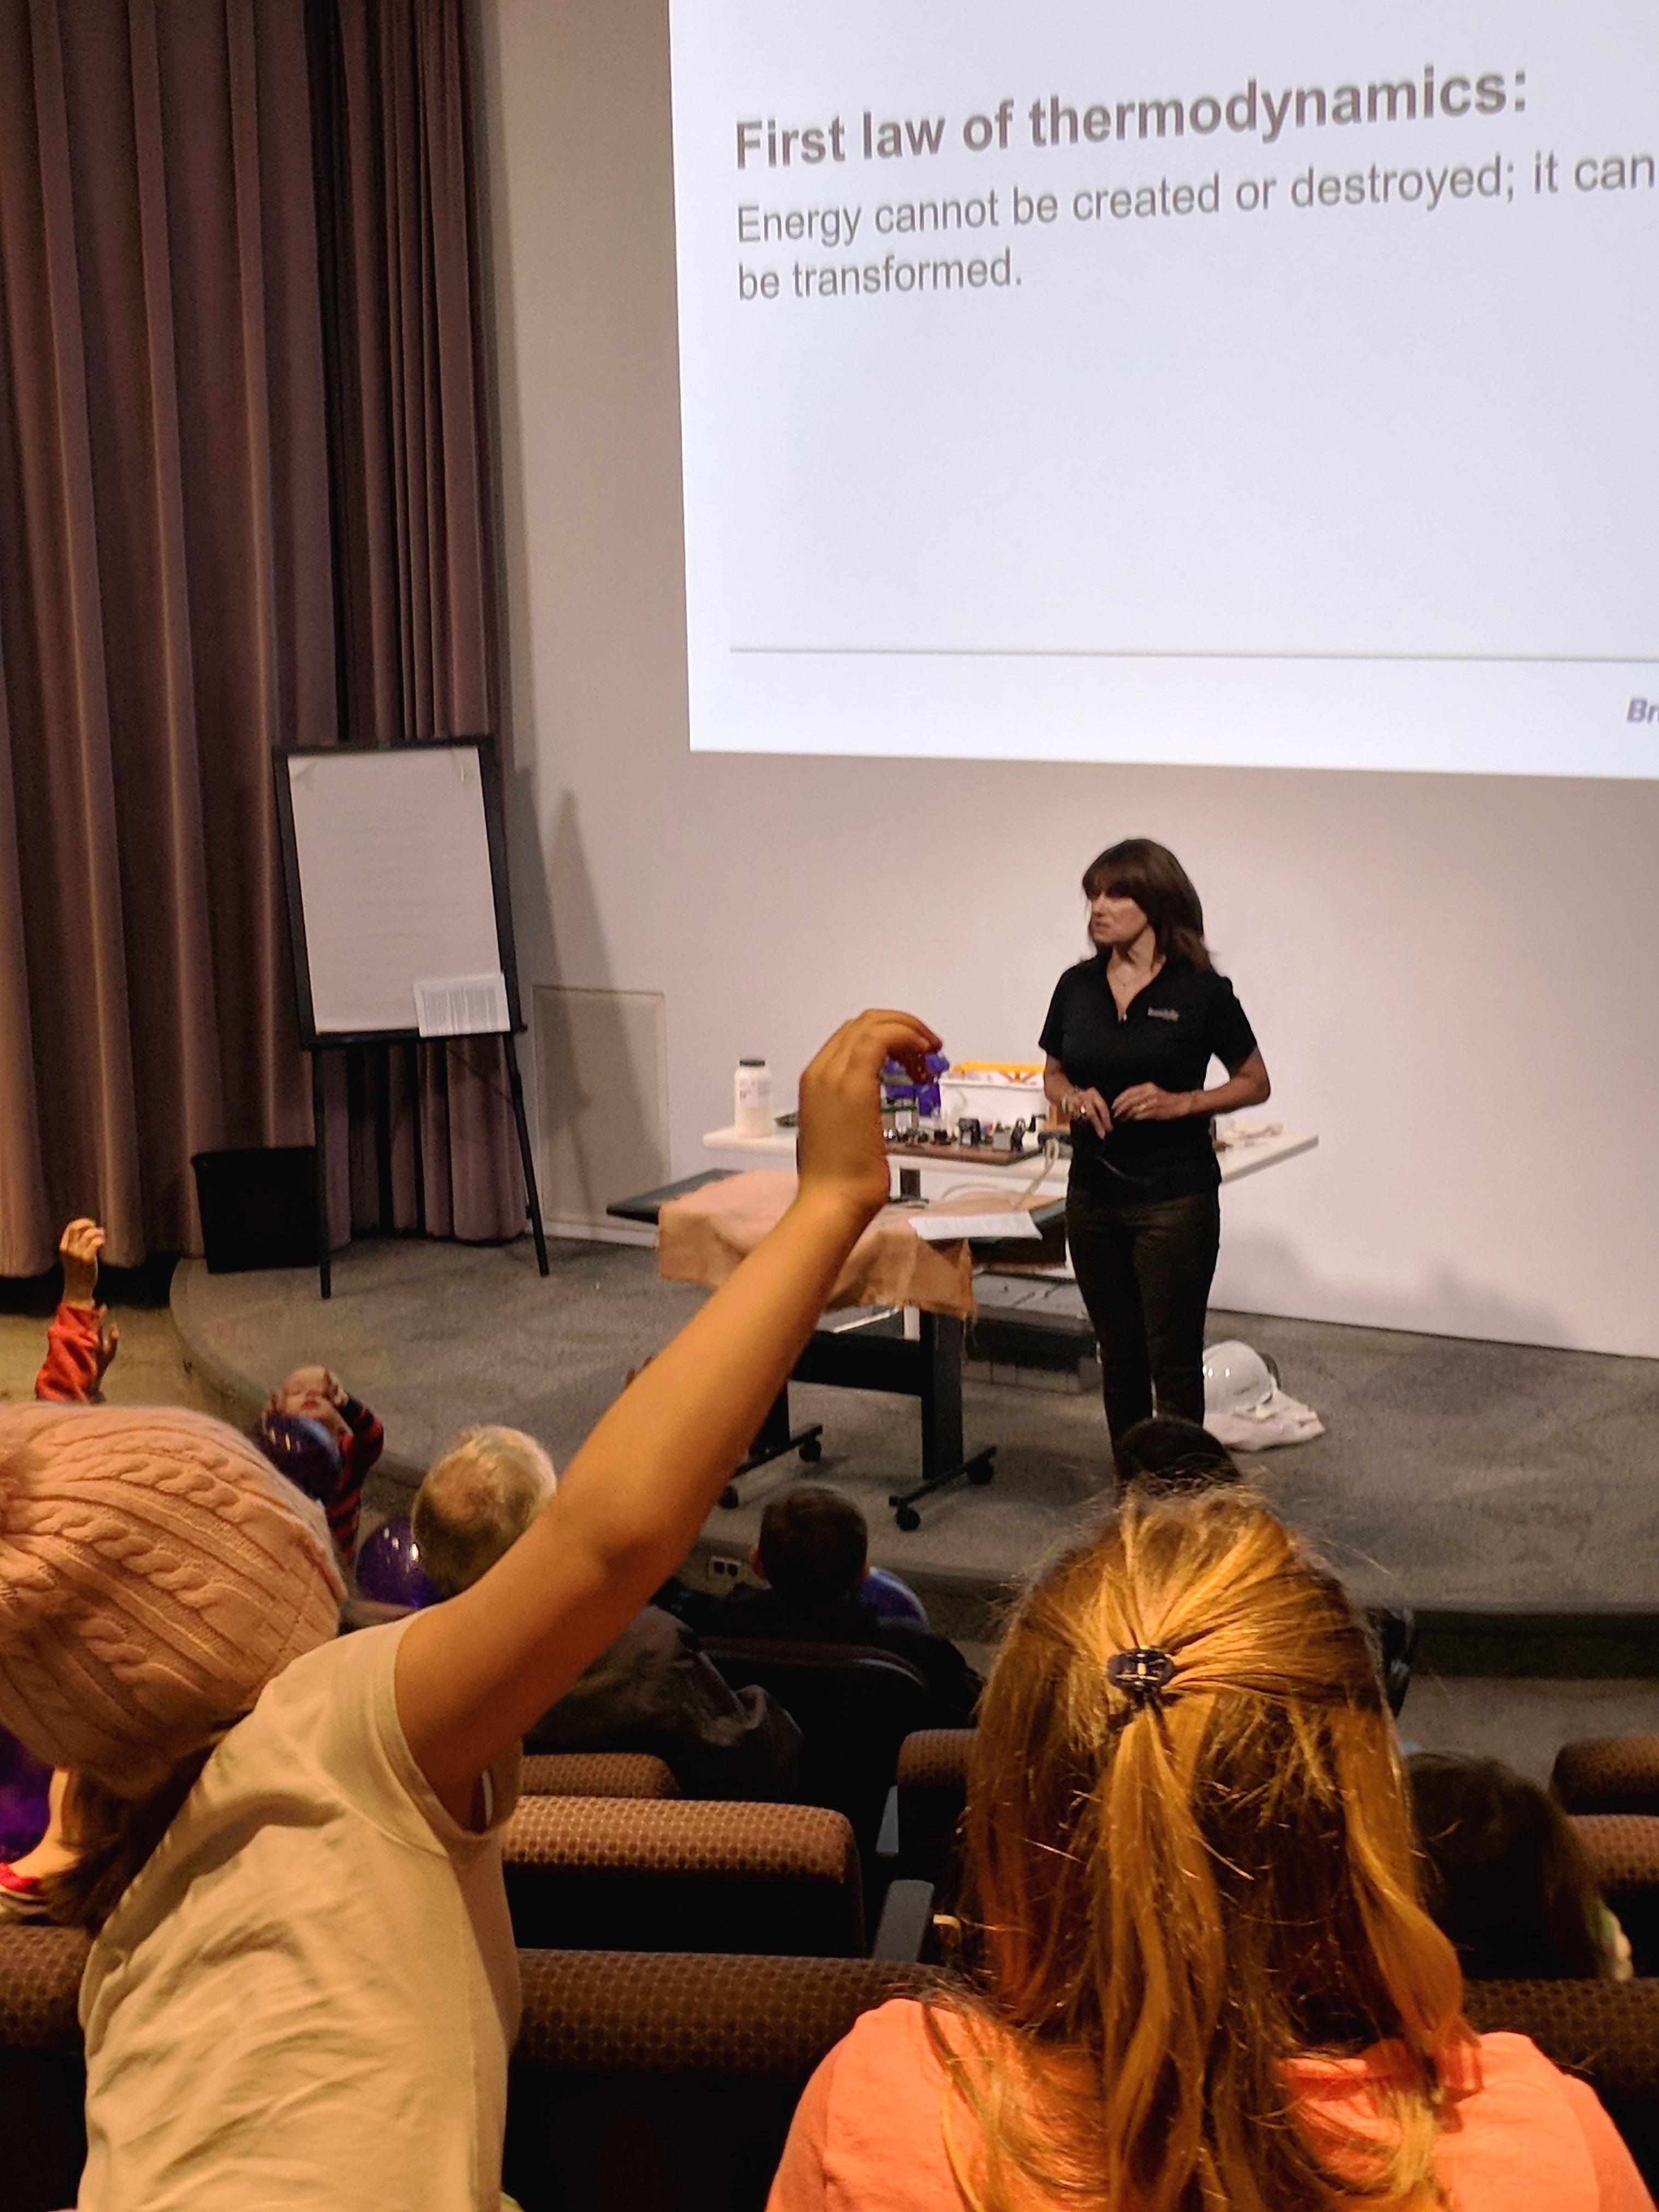 Students listen to presentation